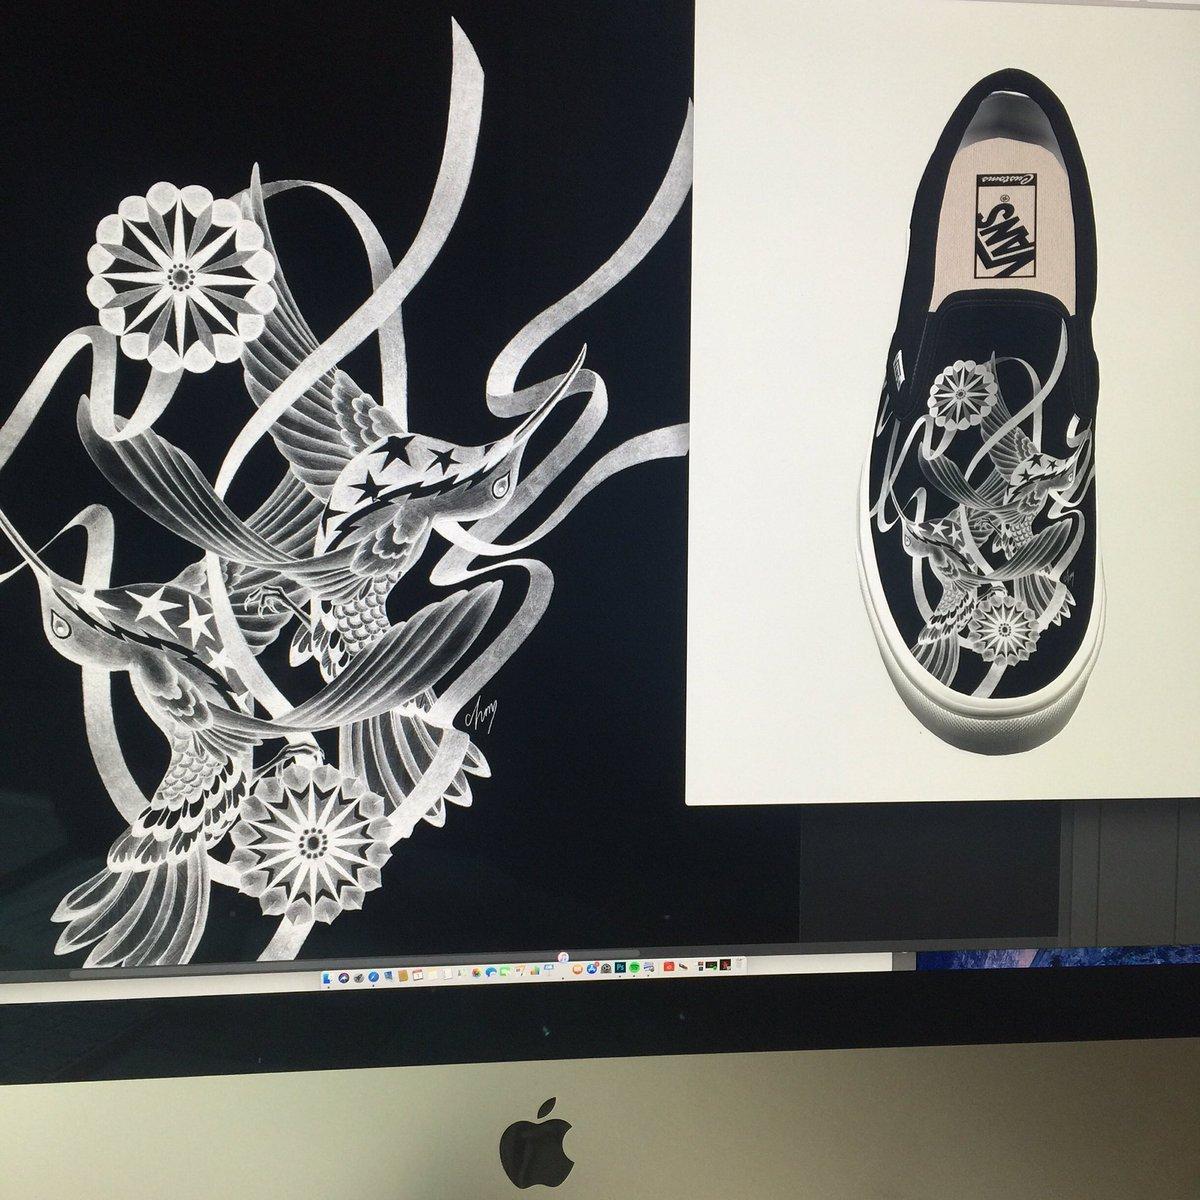 aad24d8277c823  vans  vansjapan  vanscustoms  vansvault  vansslipon  customshoes  art   artwork  design  illustration  sneakers  sneakerhead  sneakerheads   fashion  shoes ...